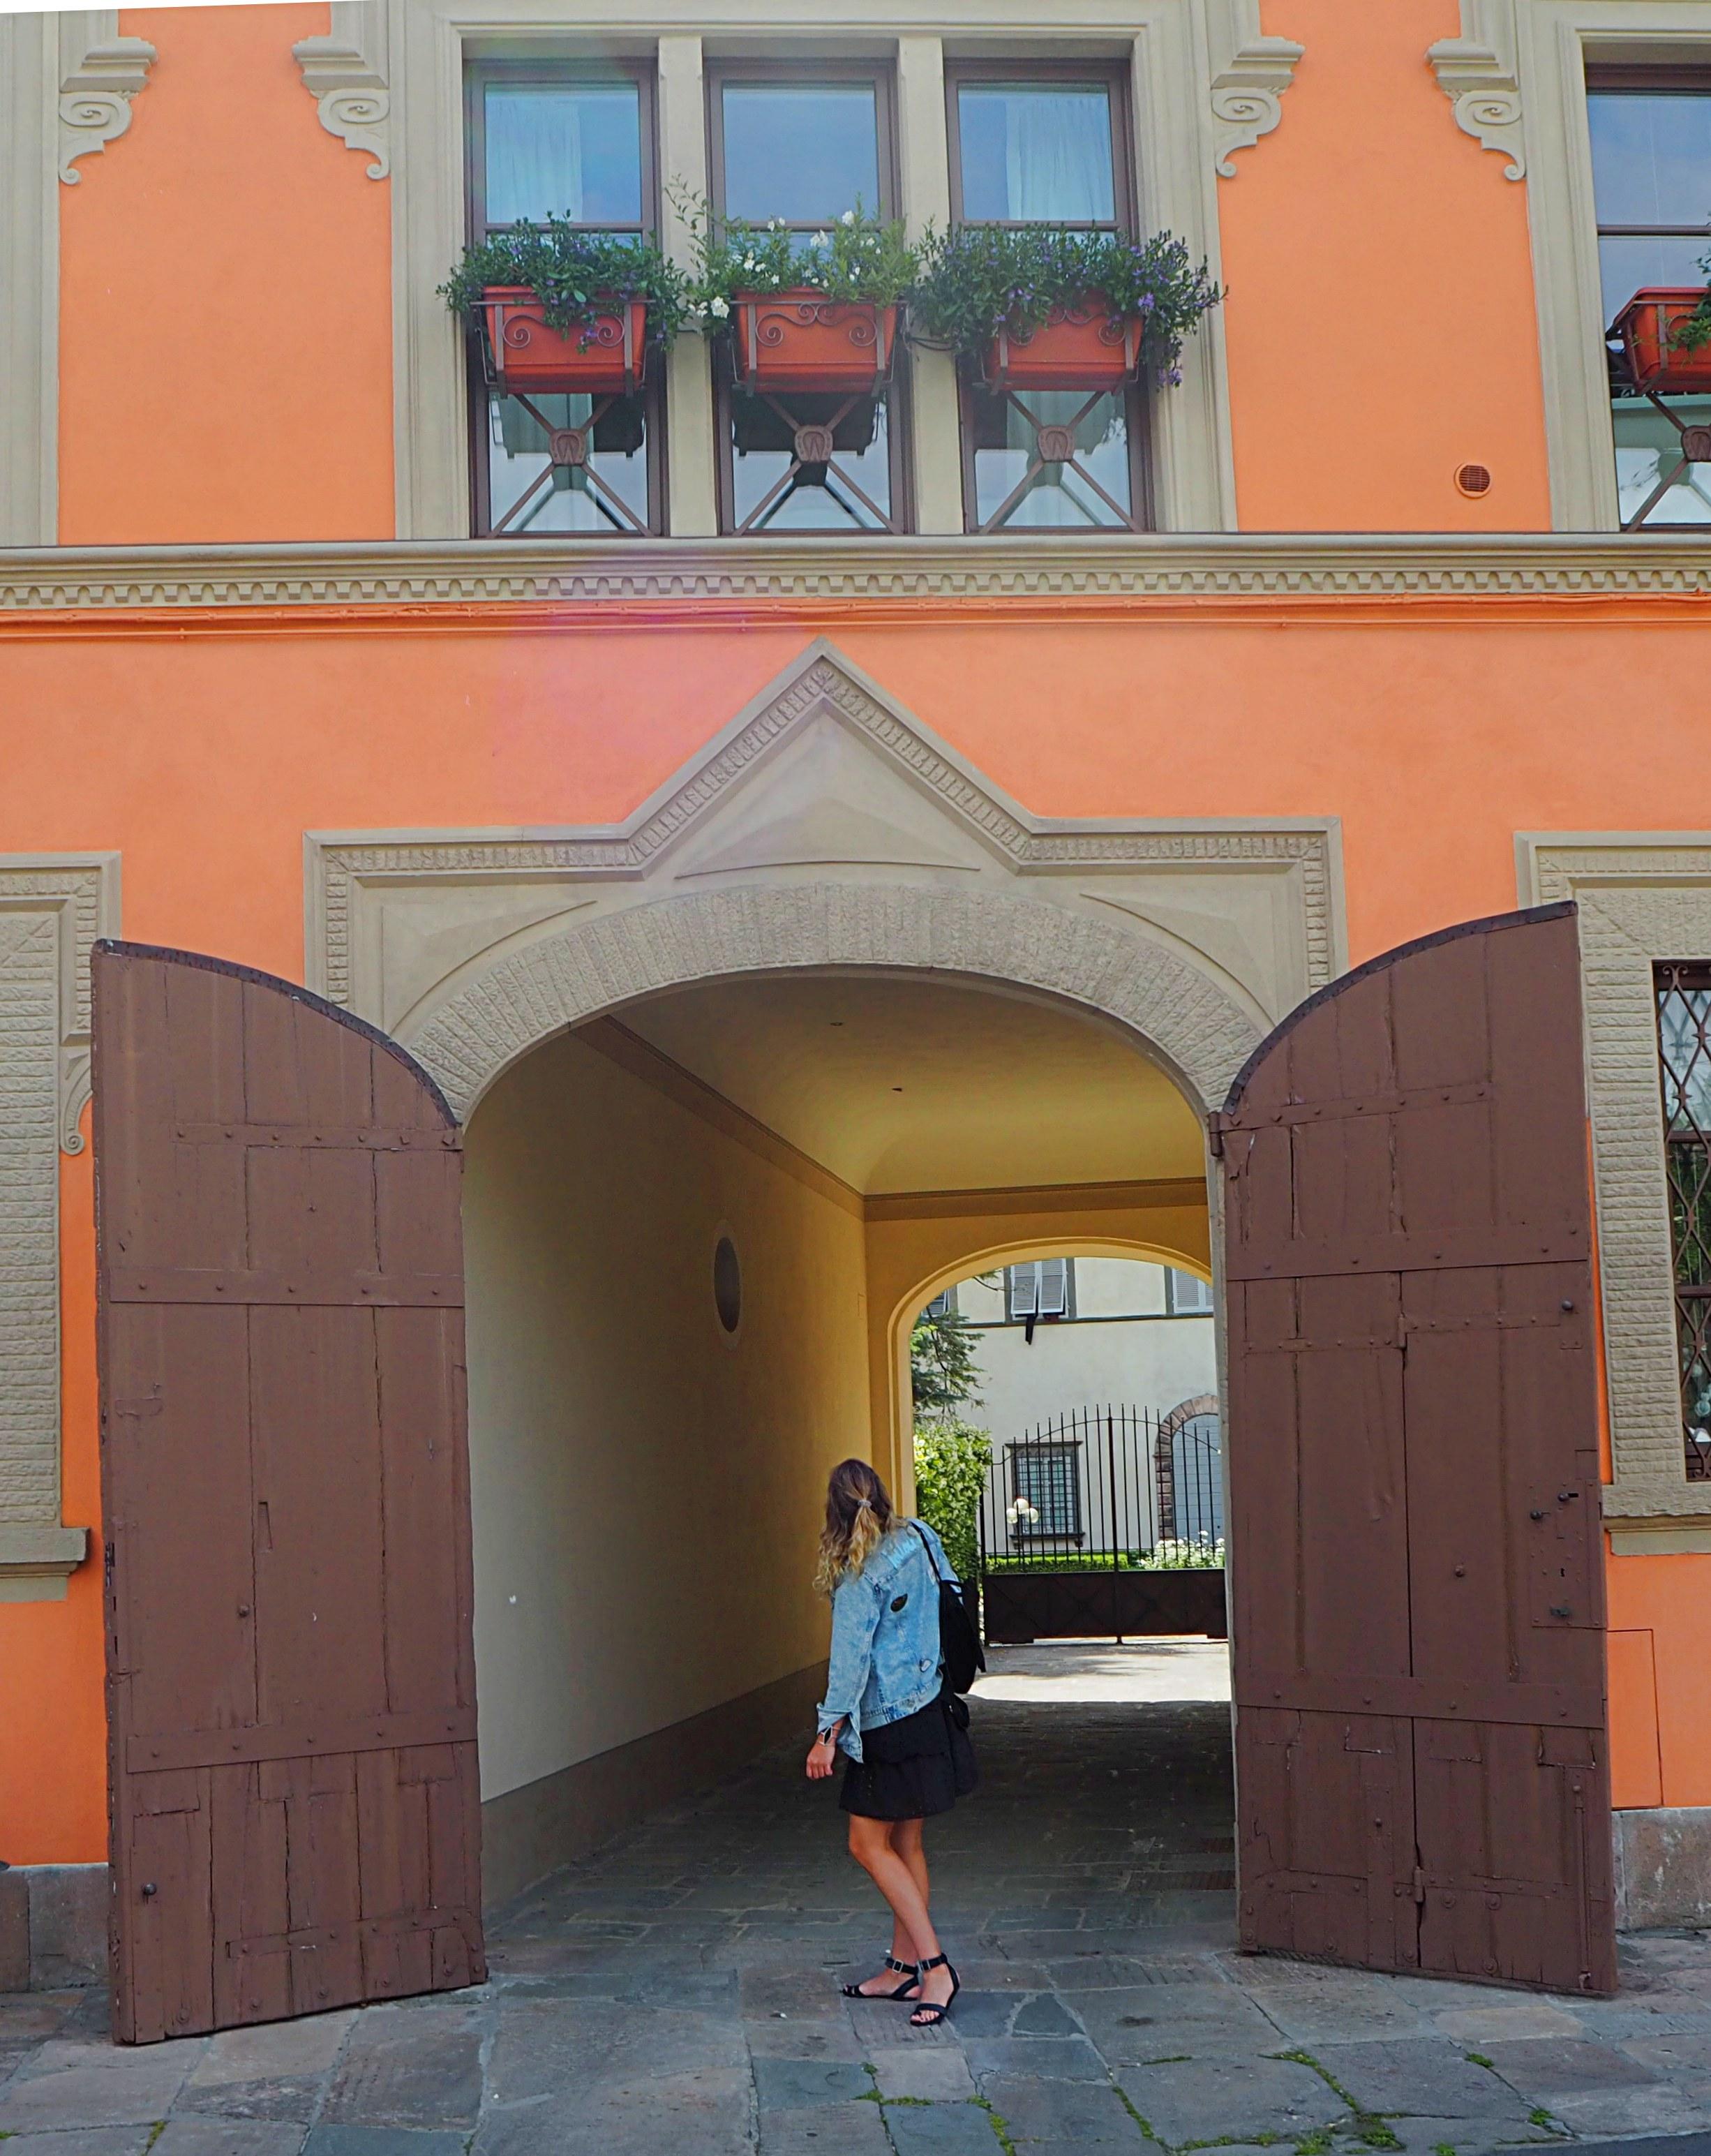 Femle Traveler Roaming through Lucca